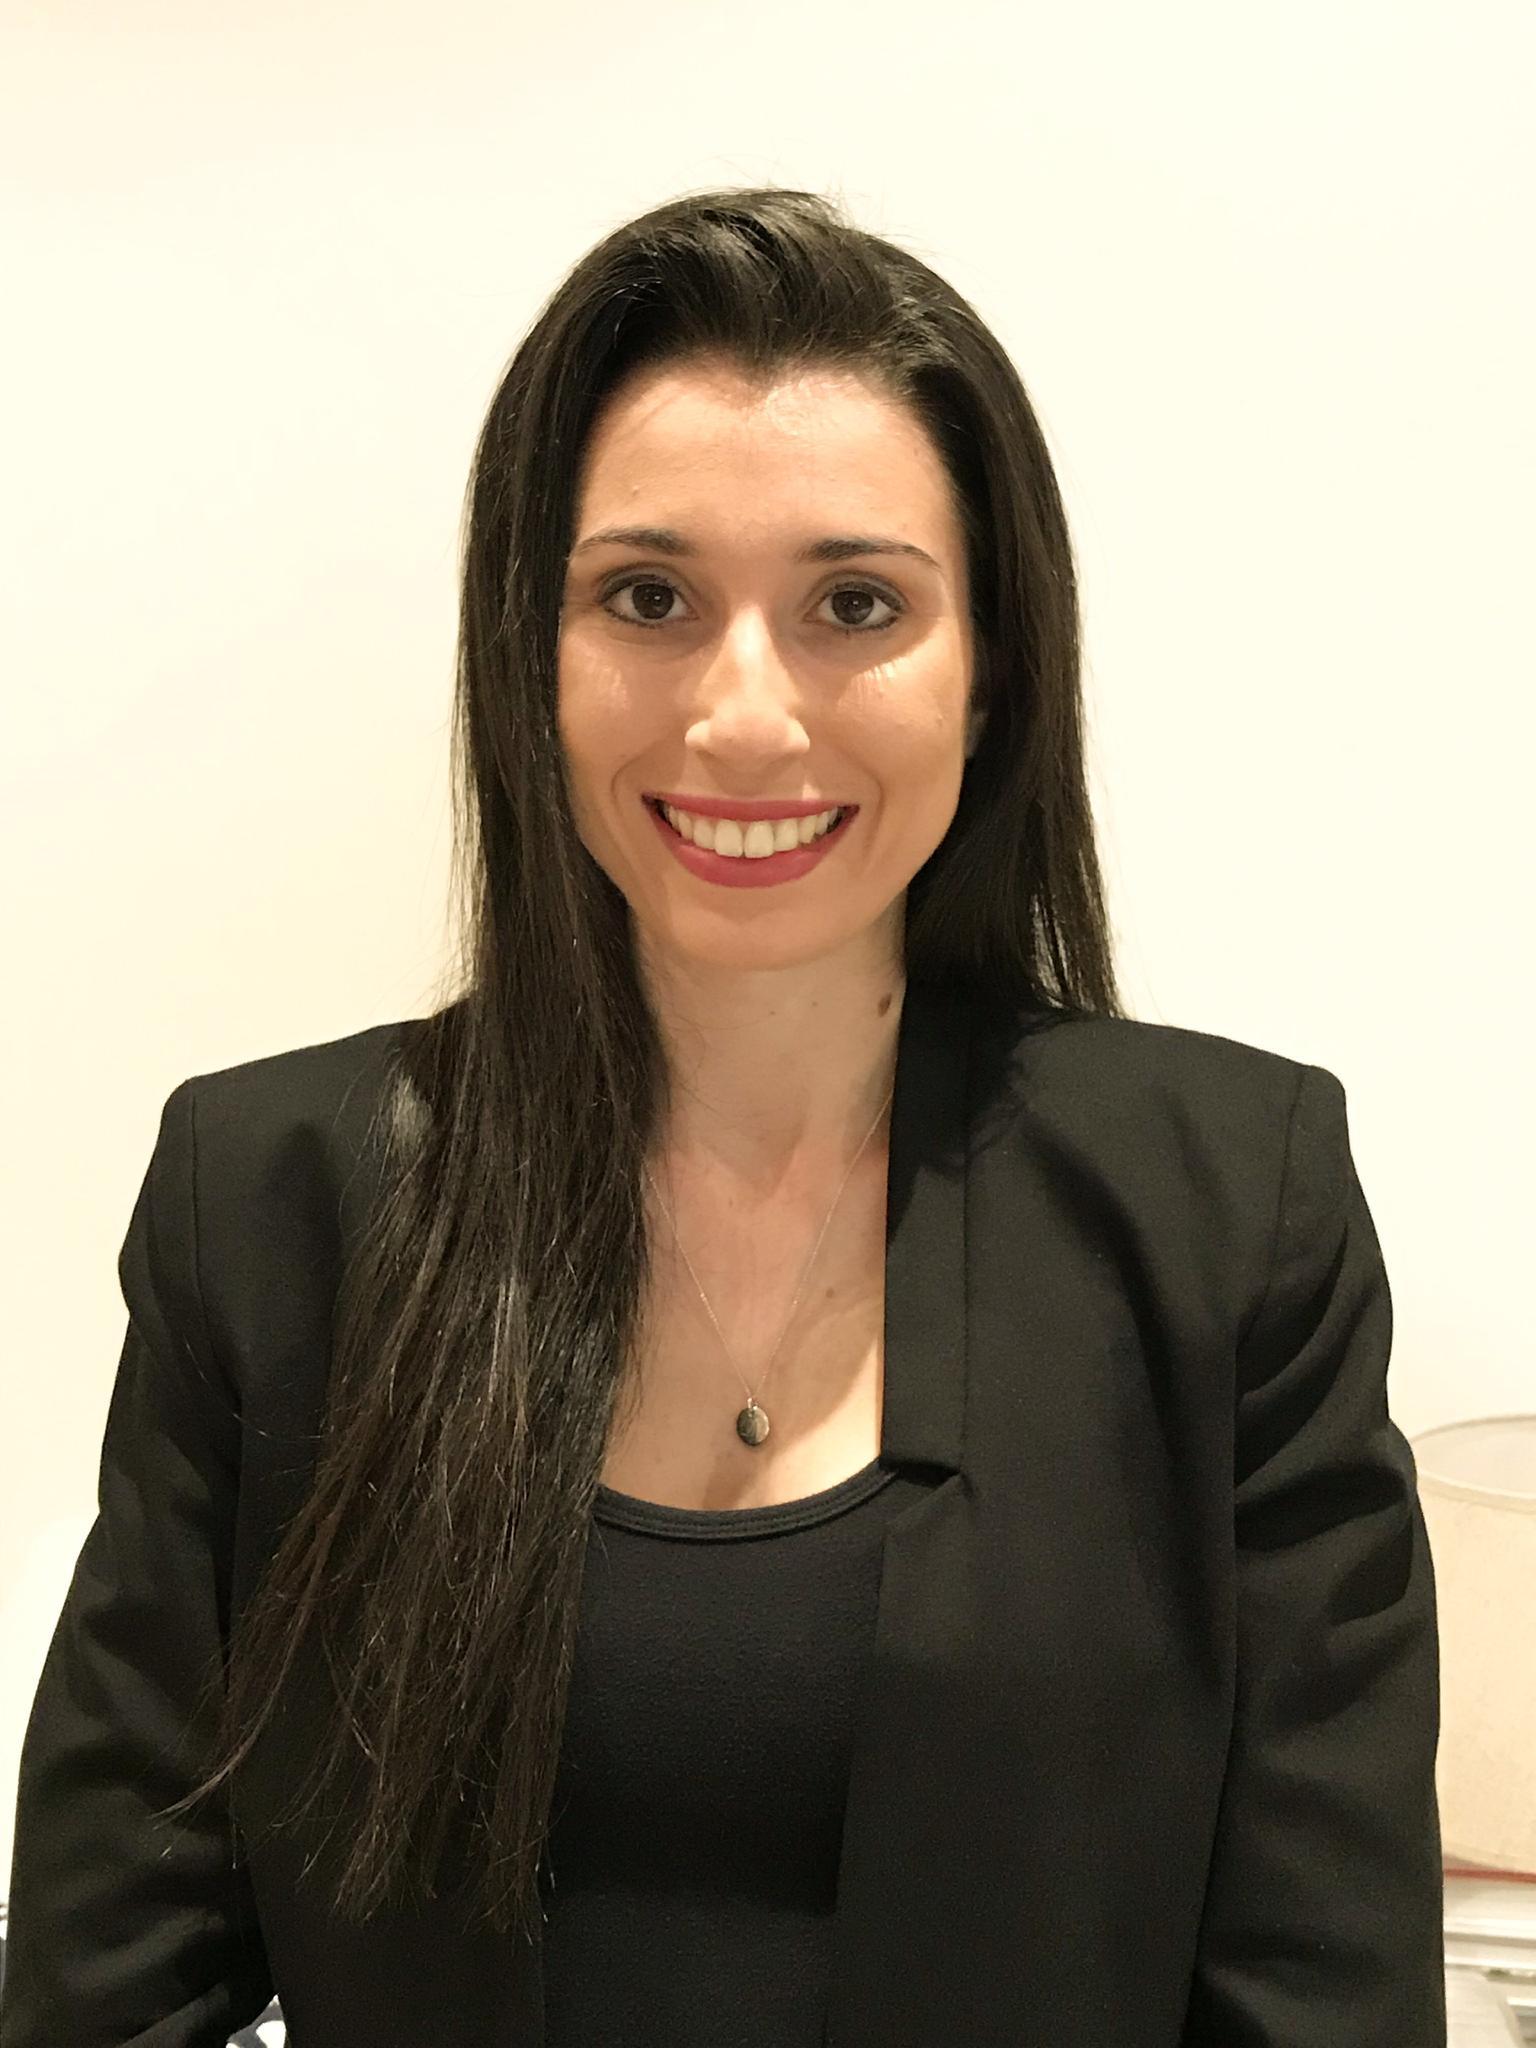 Danielle Capo